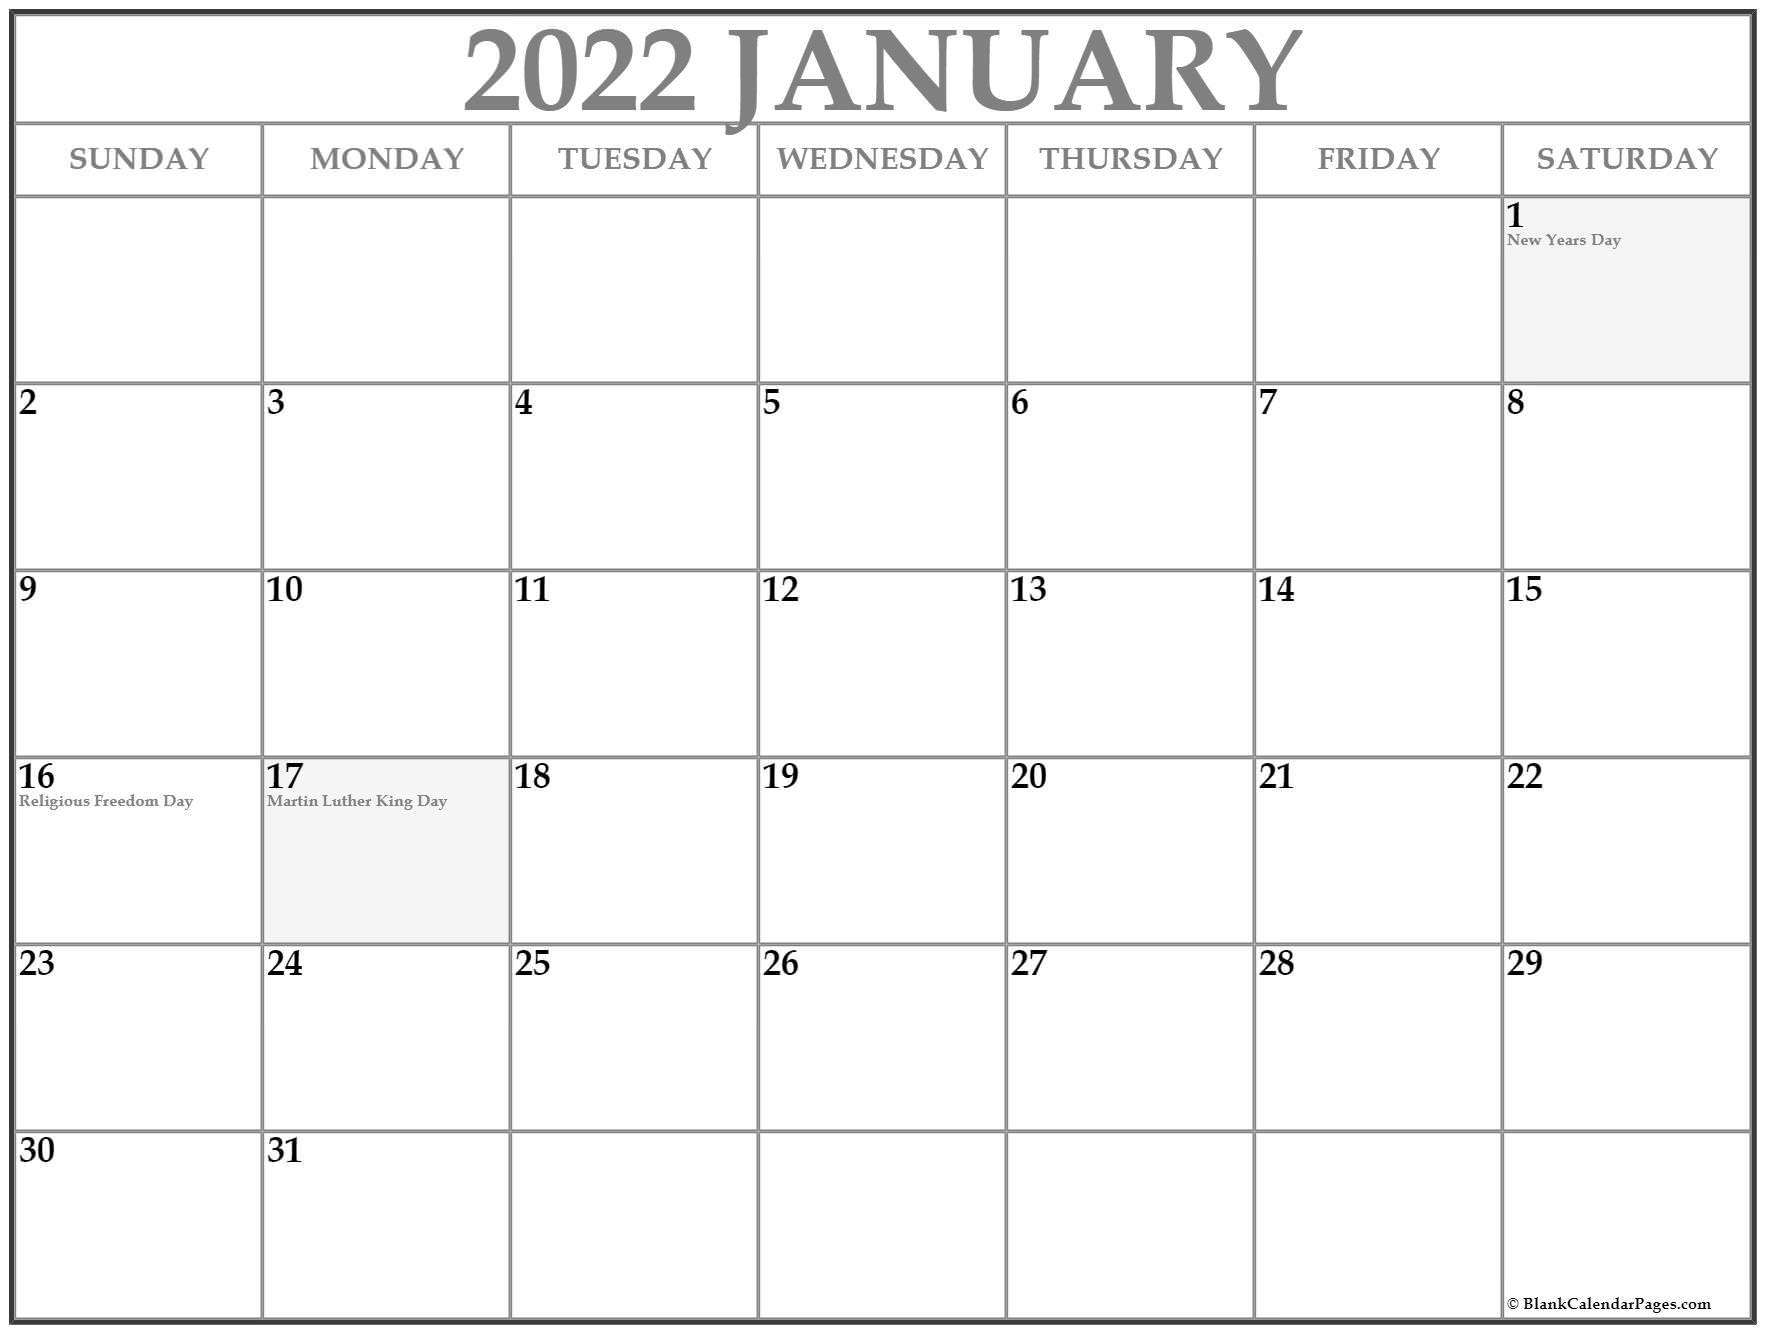 January 2022 With Holidays Calendar Inside Januarycalendar 2022 With Holidays